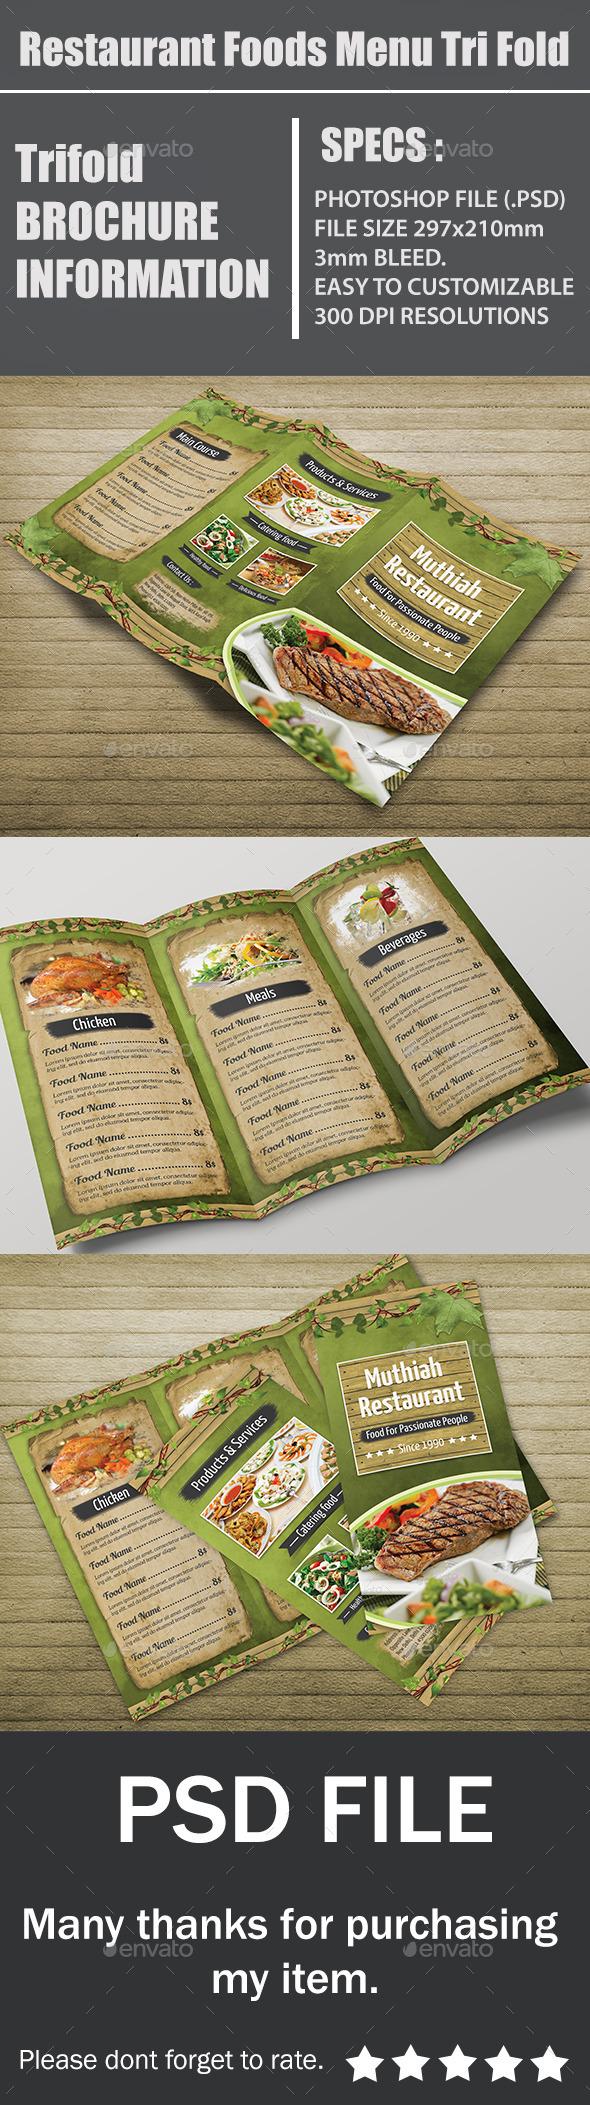 Restaurant Foods Menu Tri Fold